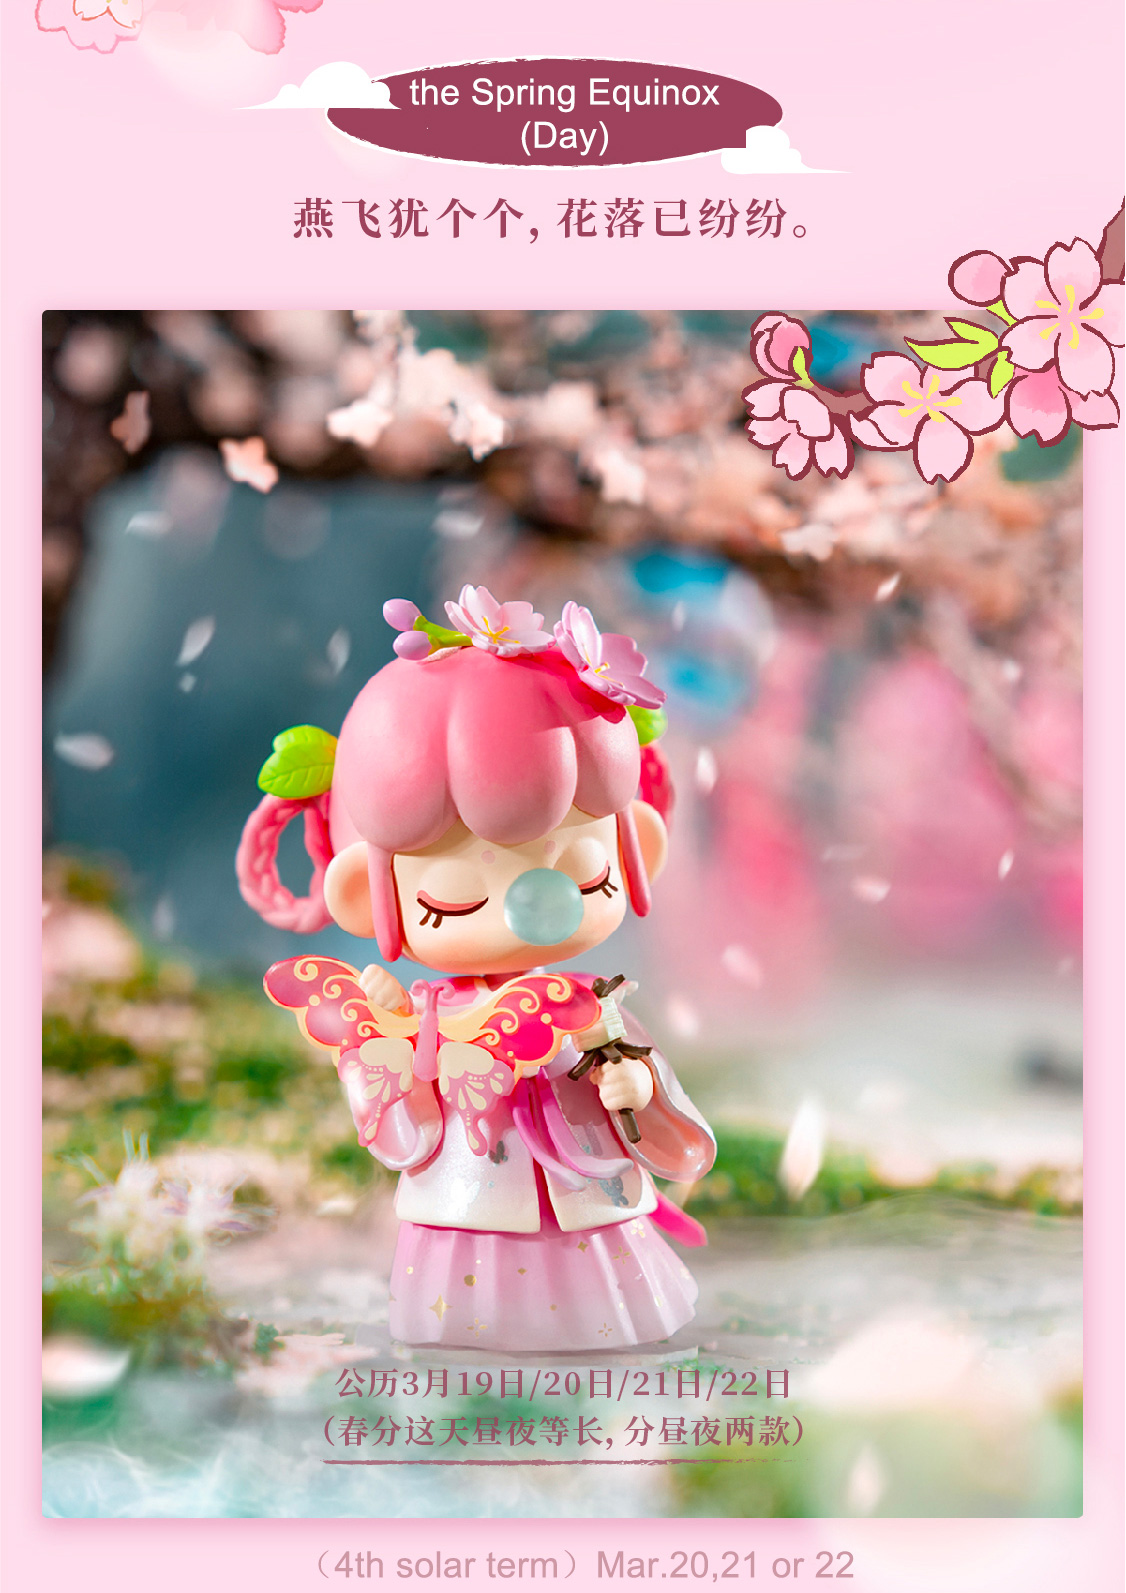 Rolife Blind Box Figure Surprise Dolls - Nanci 24 Solar Terms